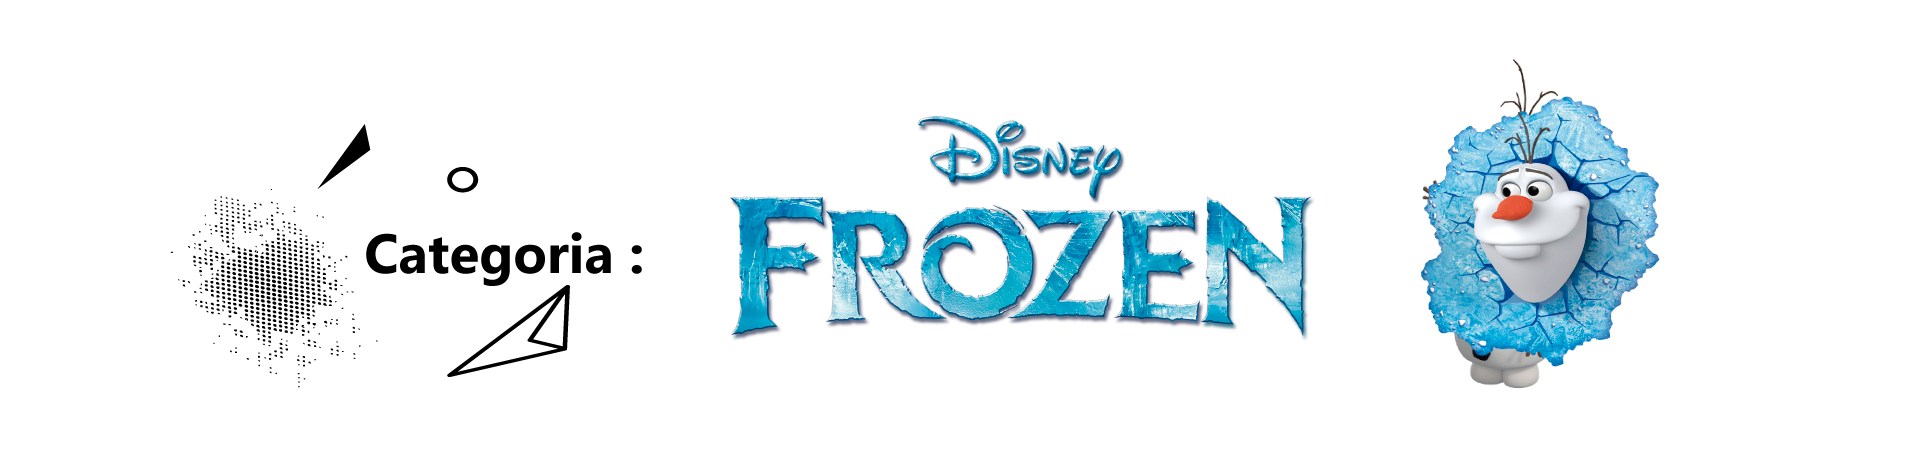 Banner categoria frozen